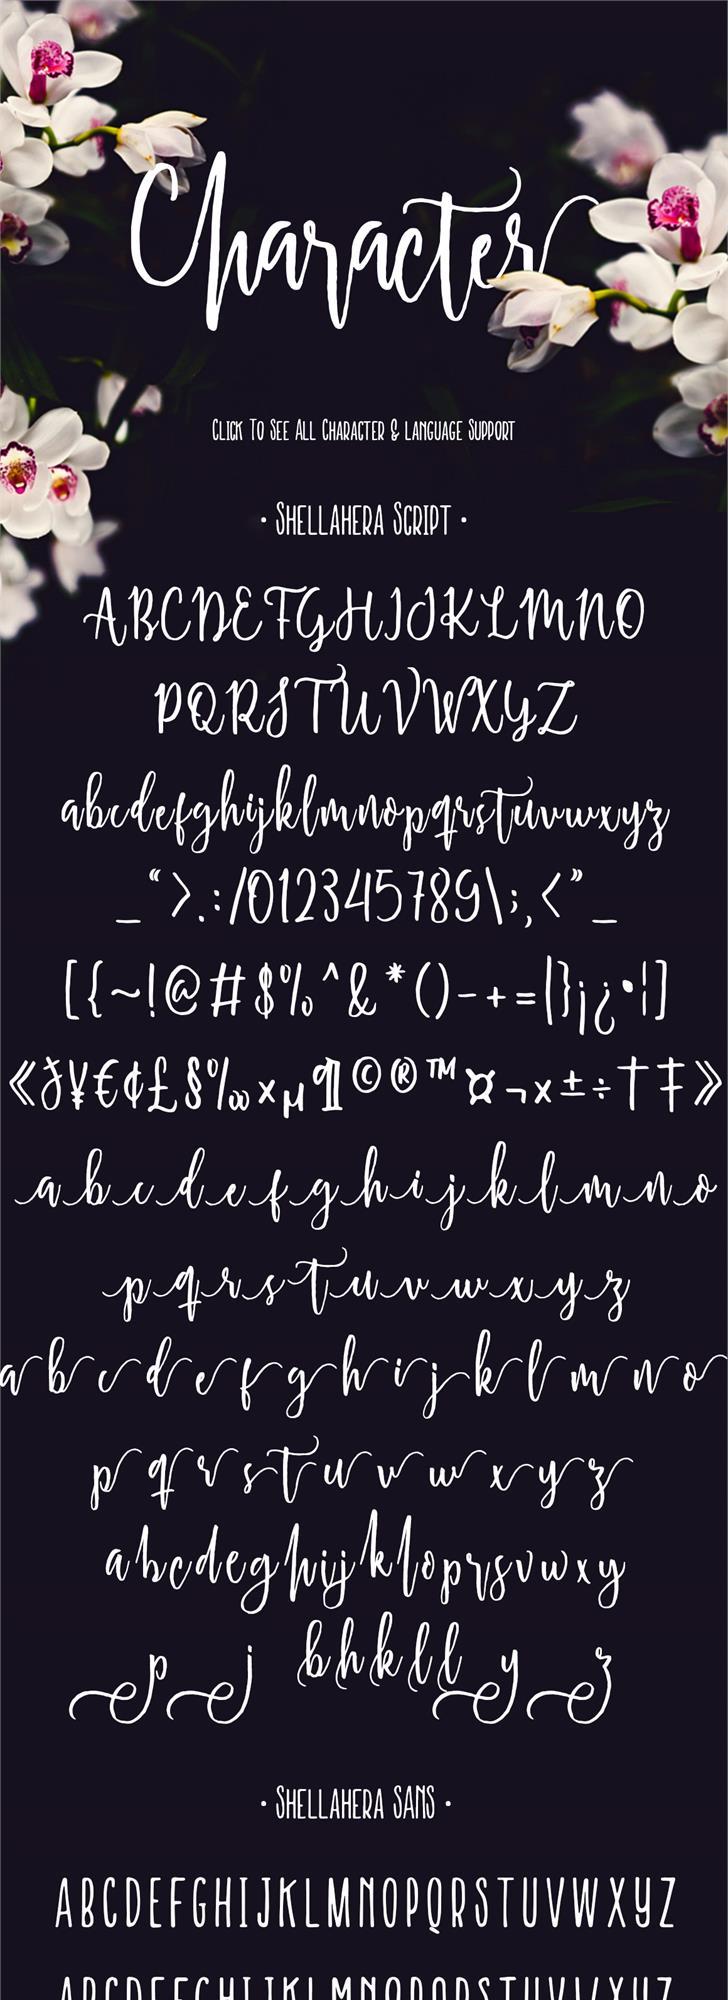 Shellahera Script Demo Font handwriting text